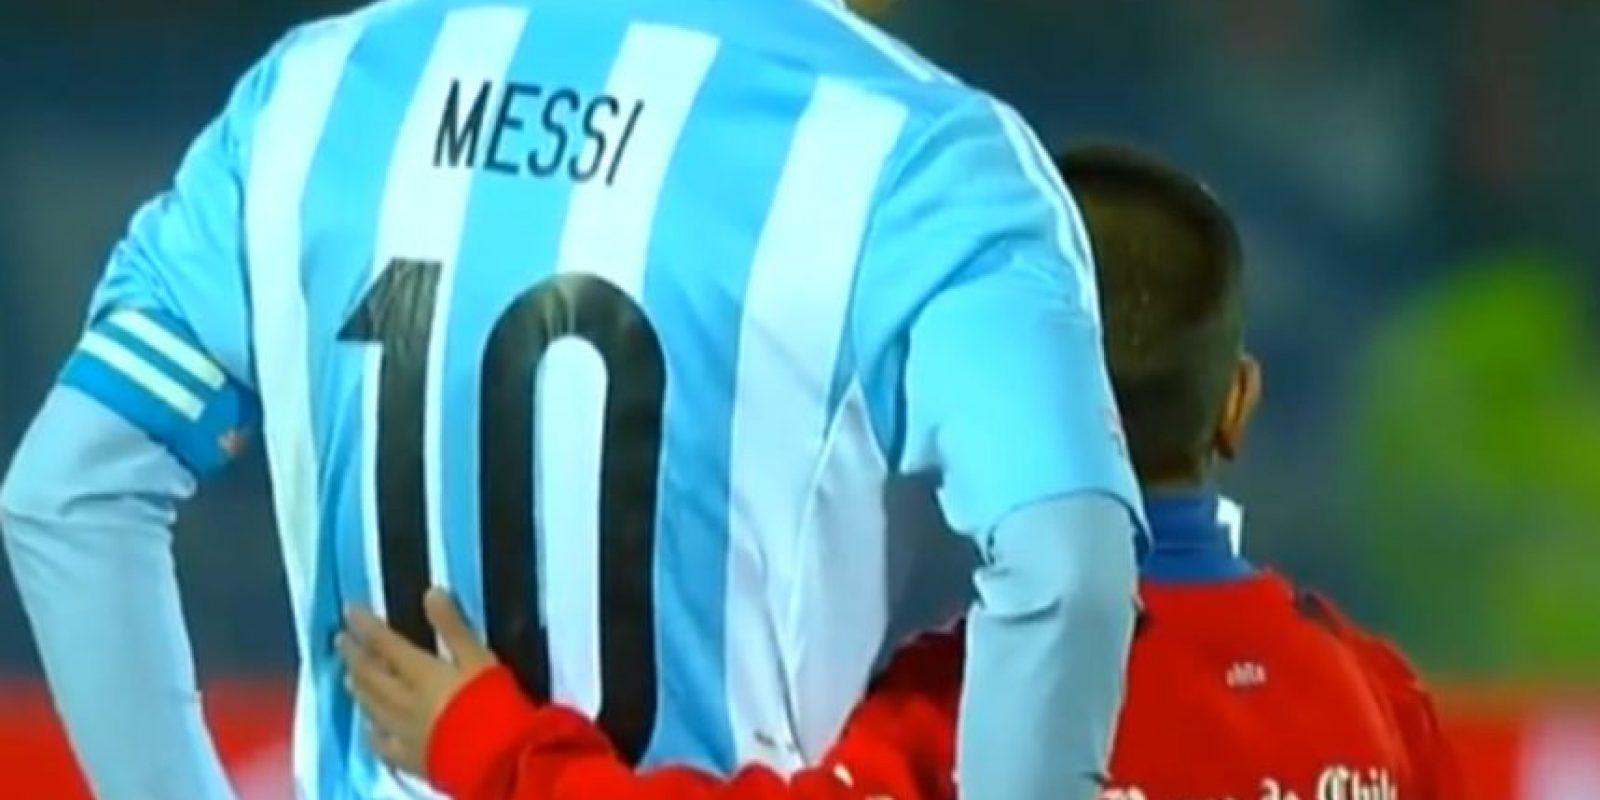 Messi en la final de la Copa América 2015